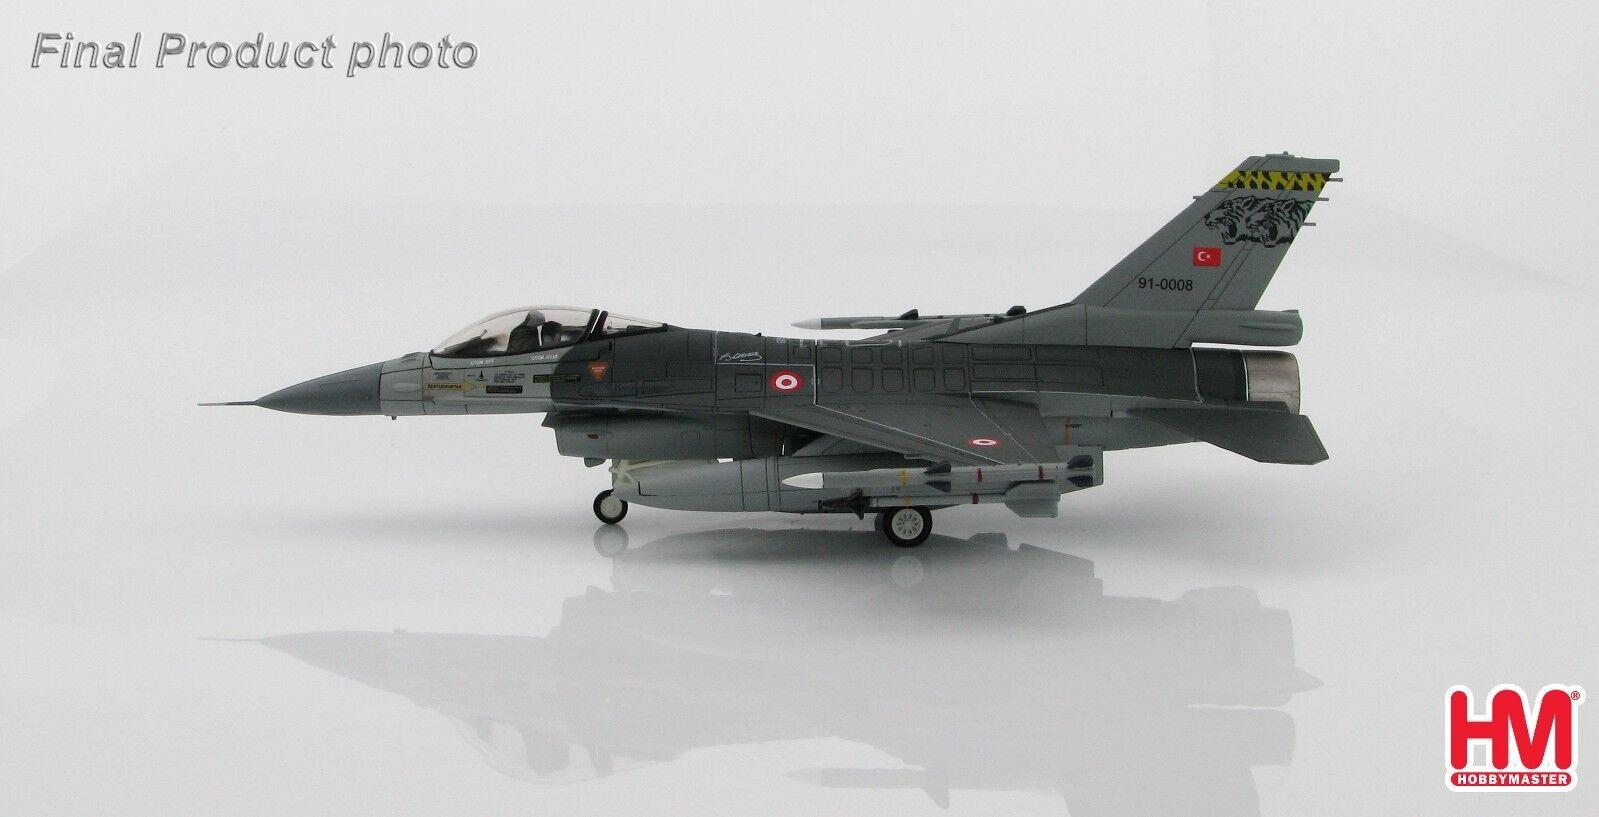 1 72 Hobbymaster Türkische Luftwaffe F-16C 91-008 MIG Killer HA3840